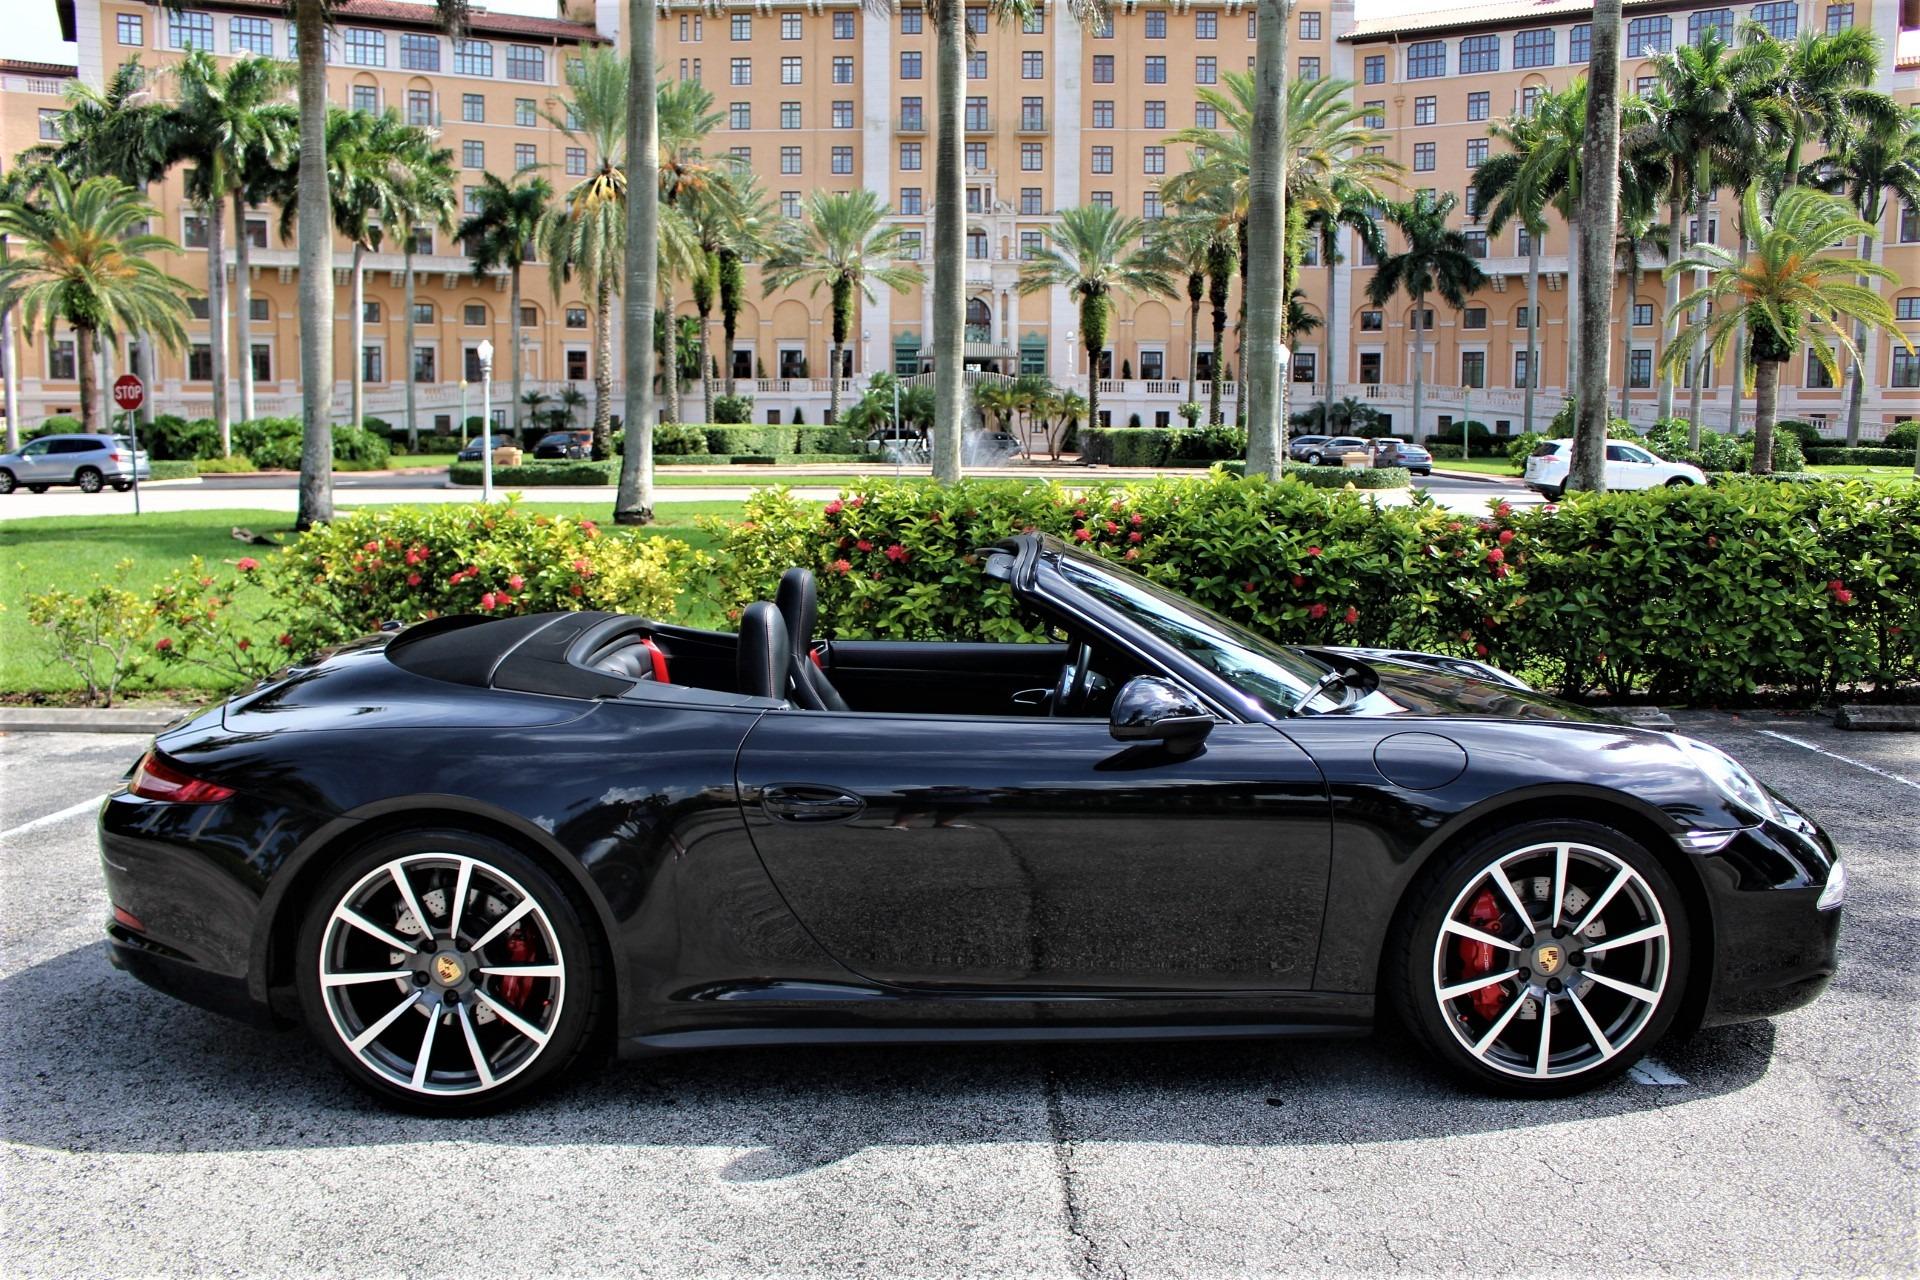 Used 2013 Porsche 911 Carrera 4S for sale $88,850 at The Gables Sports Cars in Miami FL 33146 1